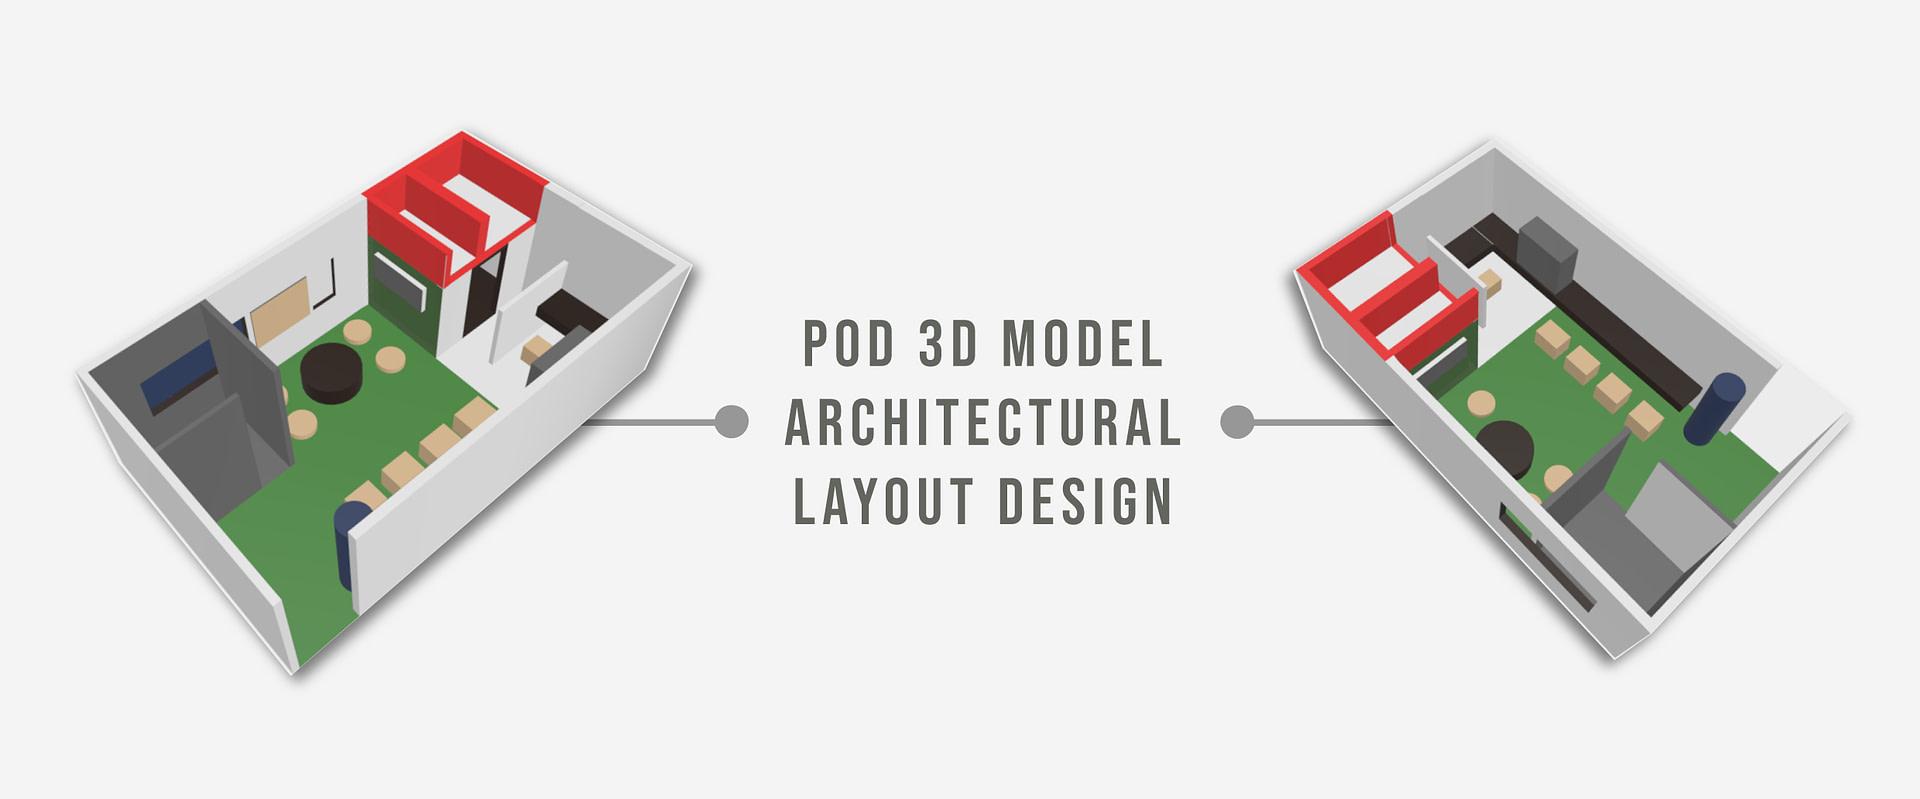 POD Architecture Isometric 3D Model